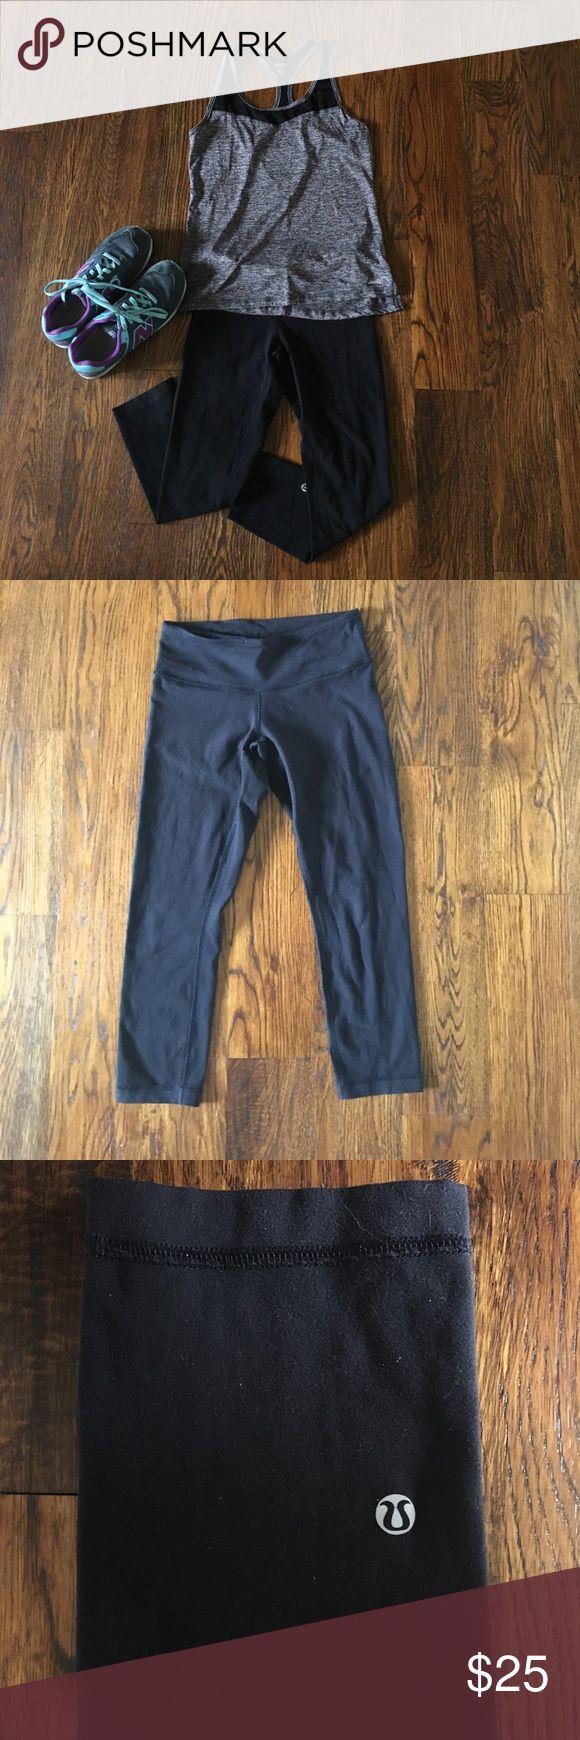 LULU LEMON Black Leggings LULU LEMON Black leggings. Capri length leggings size 4. Fit great and as always they are the best booty push up bra :) lululemon athletica Pants Leggings